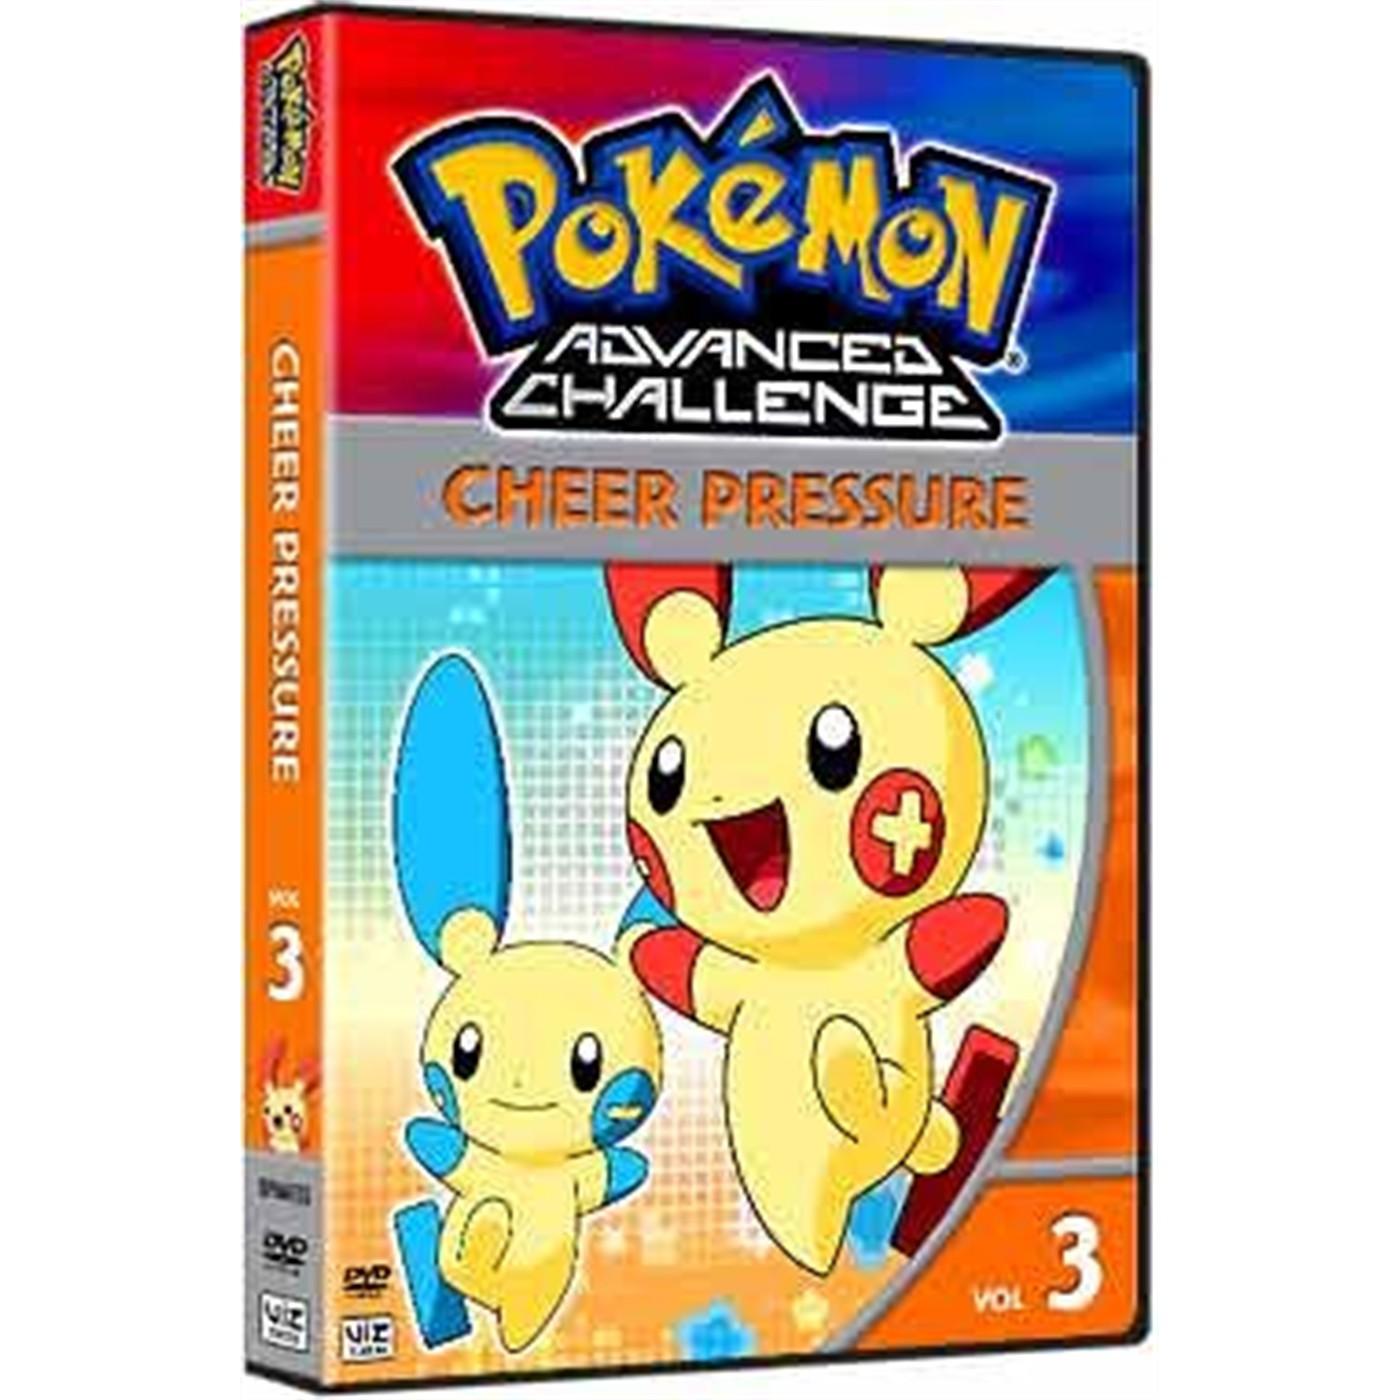 Pokemon Advanced Challenge, Vol. 3 (DVD)